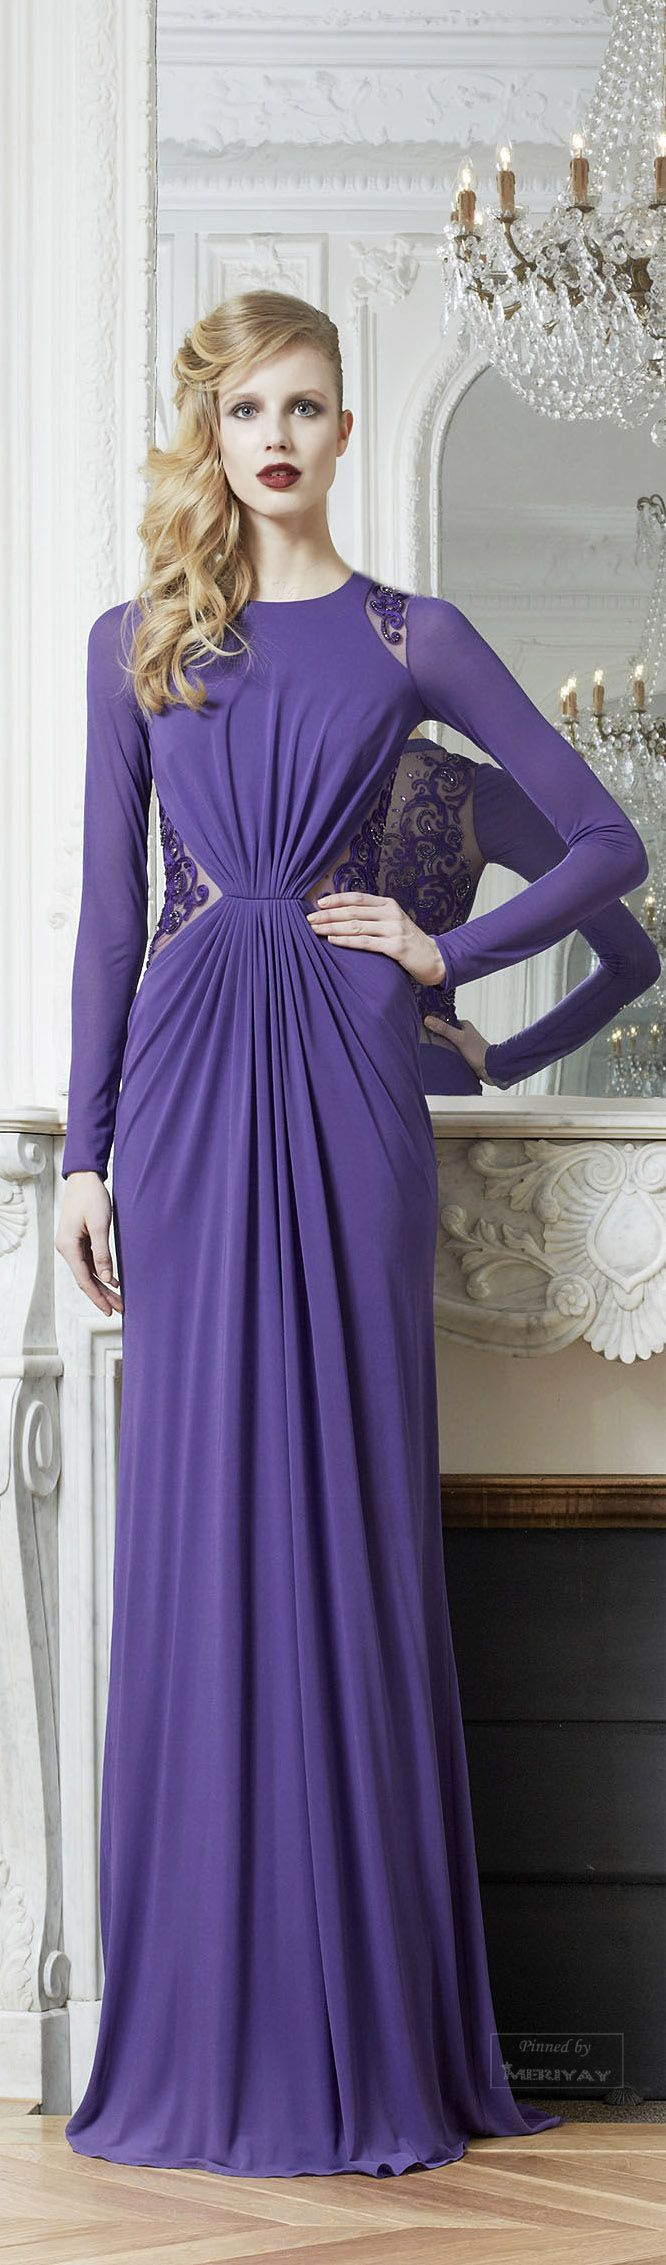 Light purple long lace dress